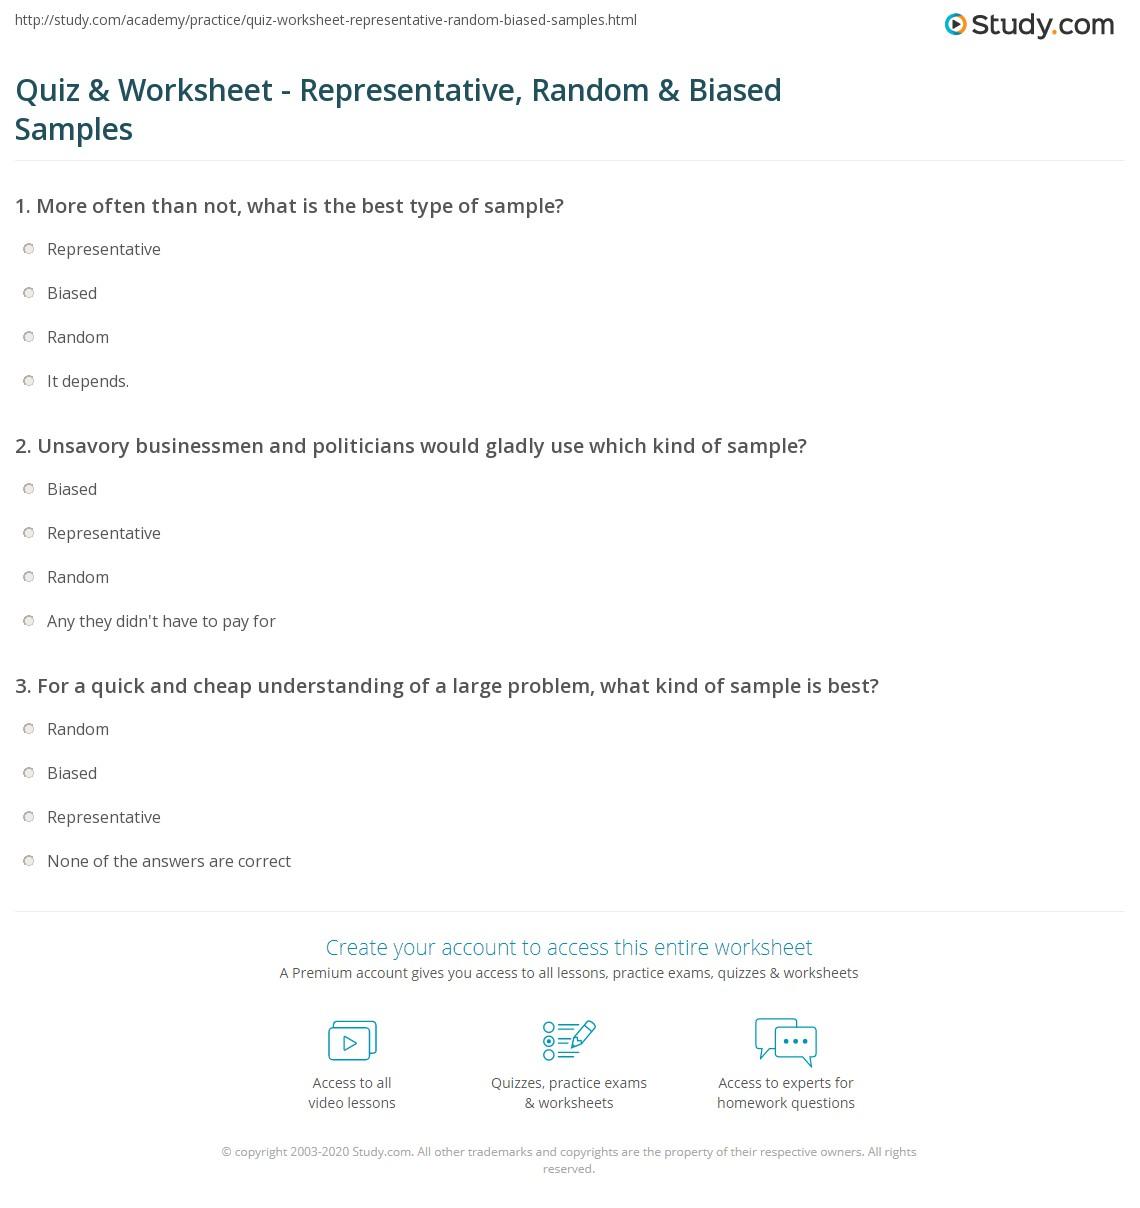 Quiz & Worksheet - Representative, Random & Biased Samples | Study.com